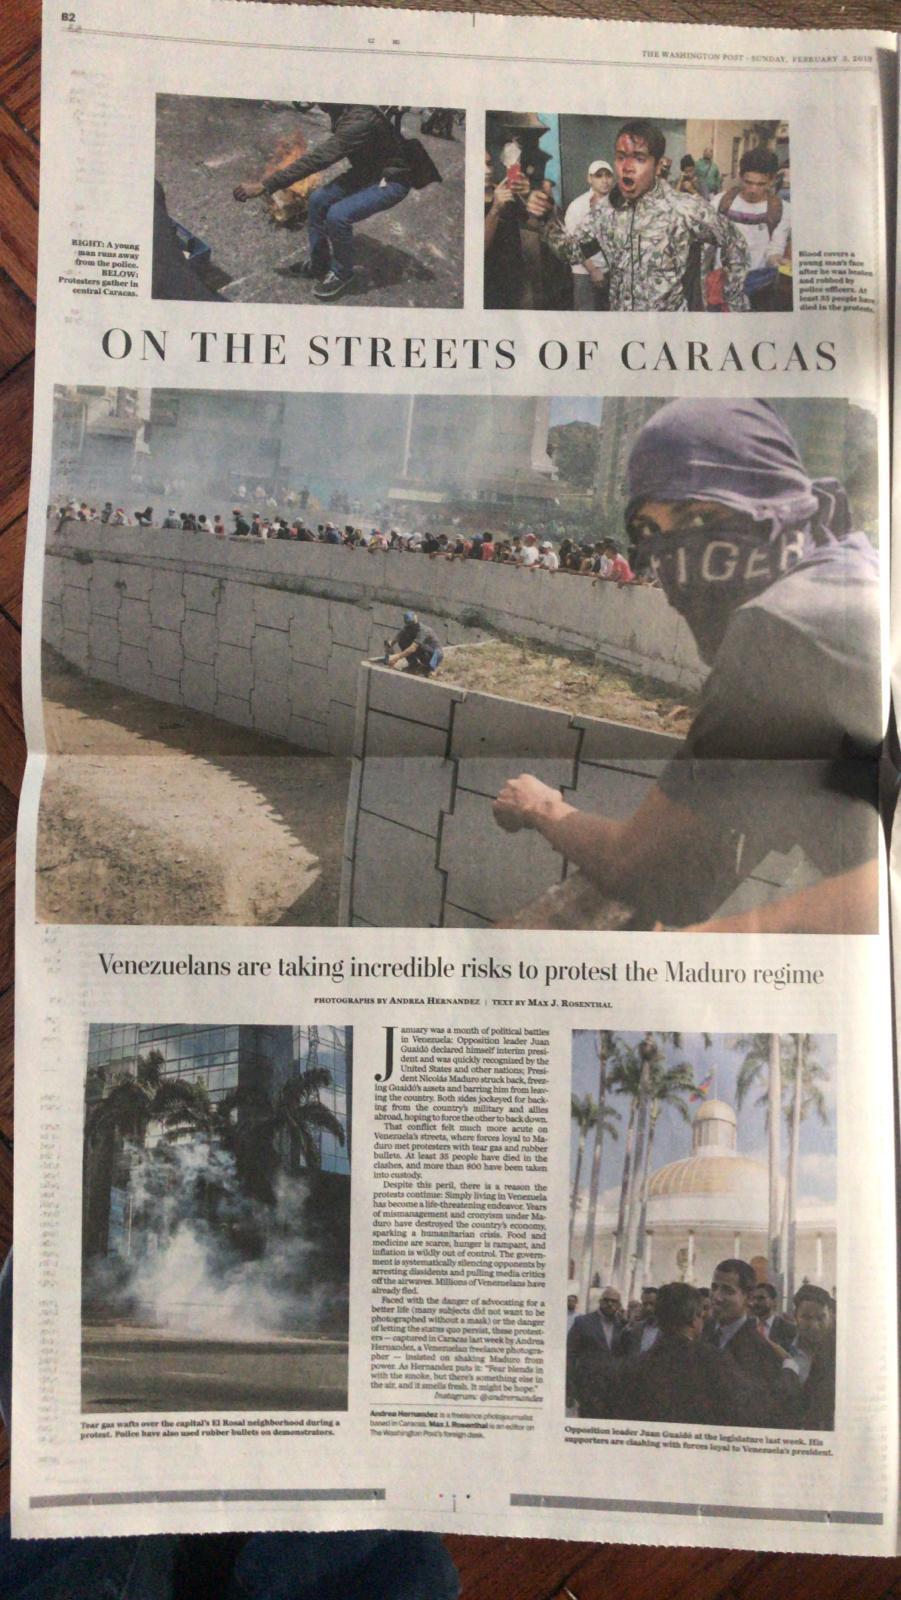 The Washington Post AndreaHernandez